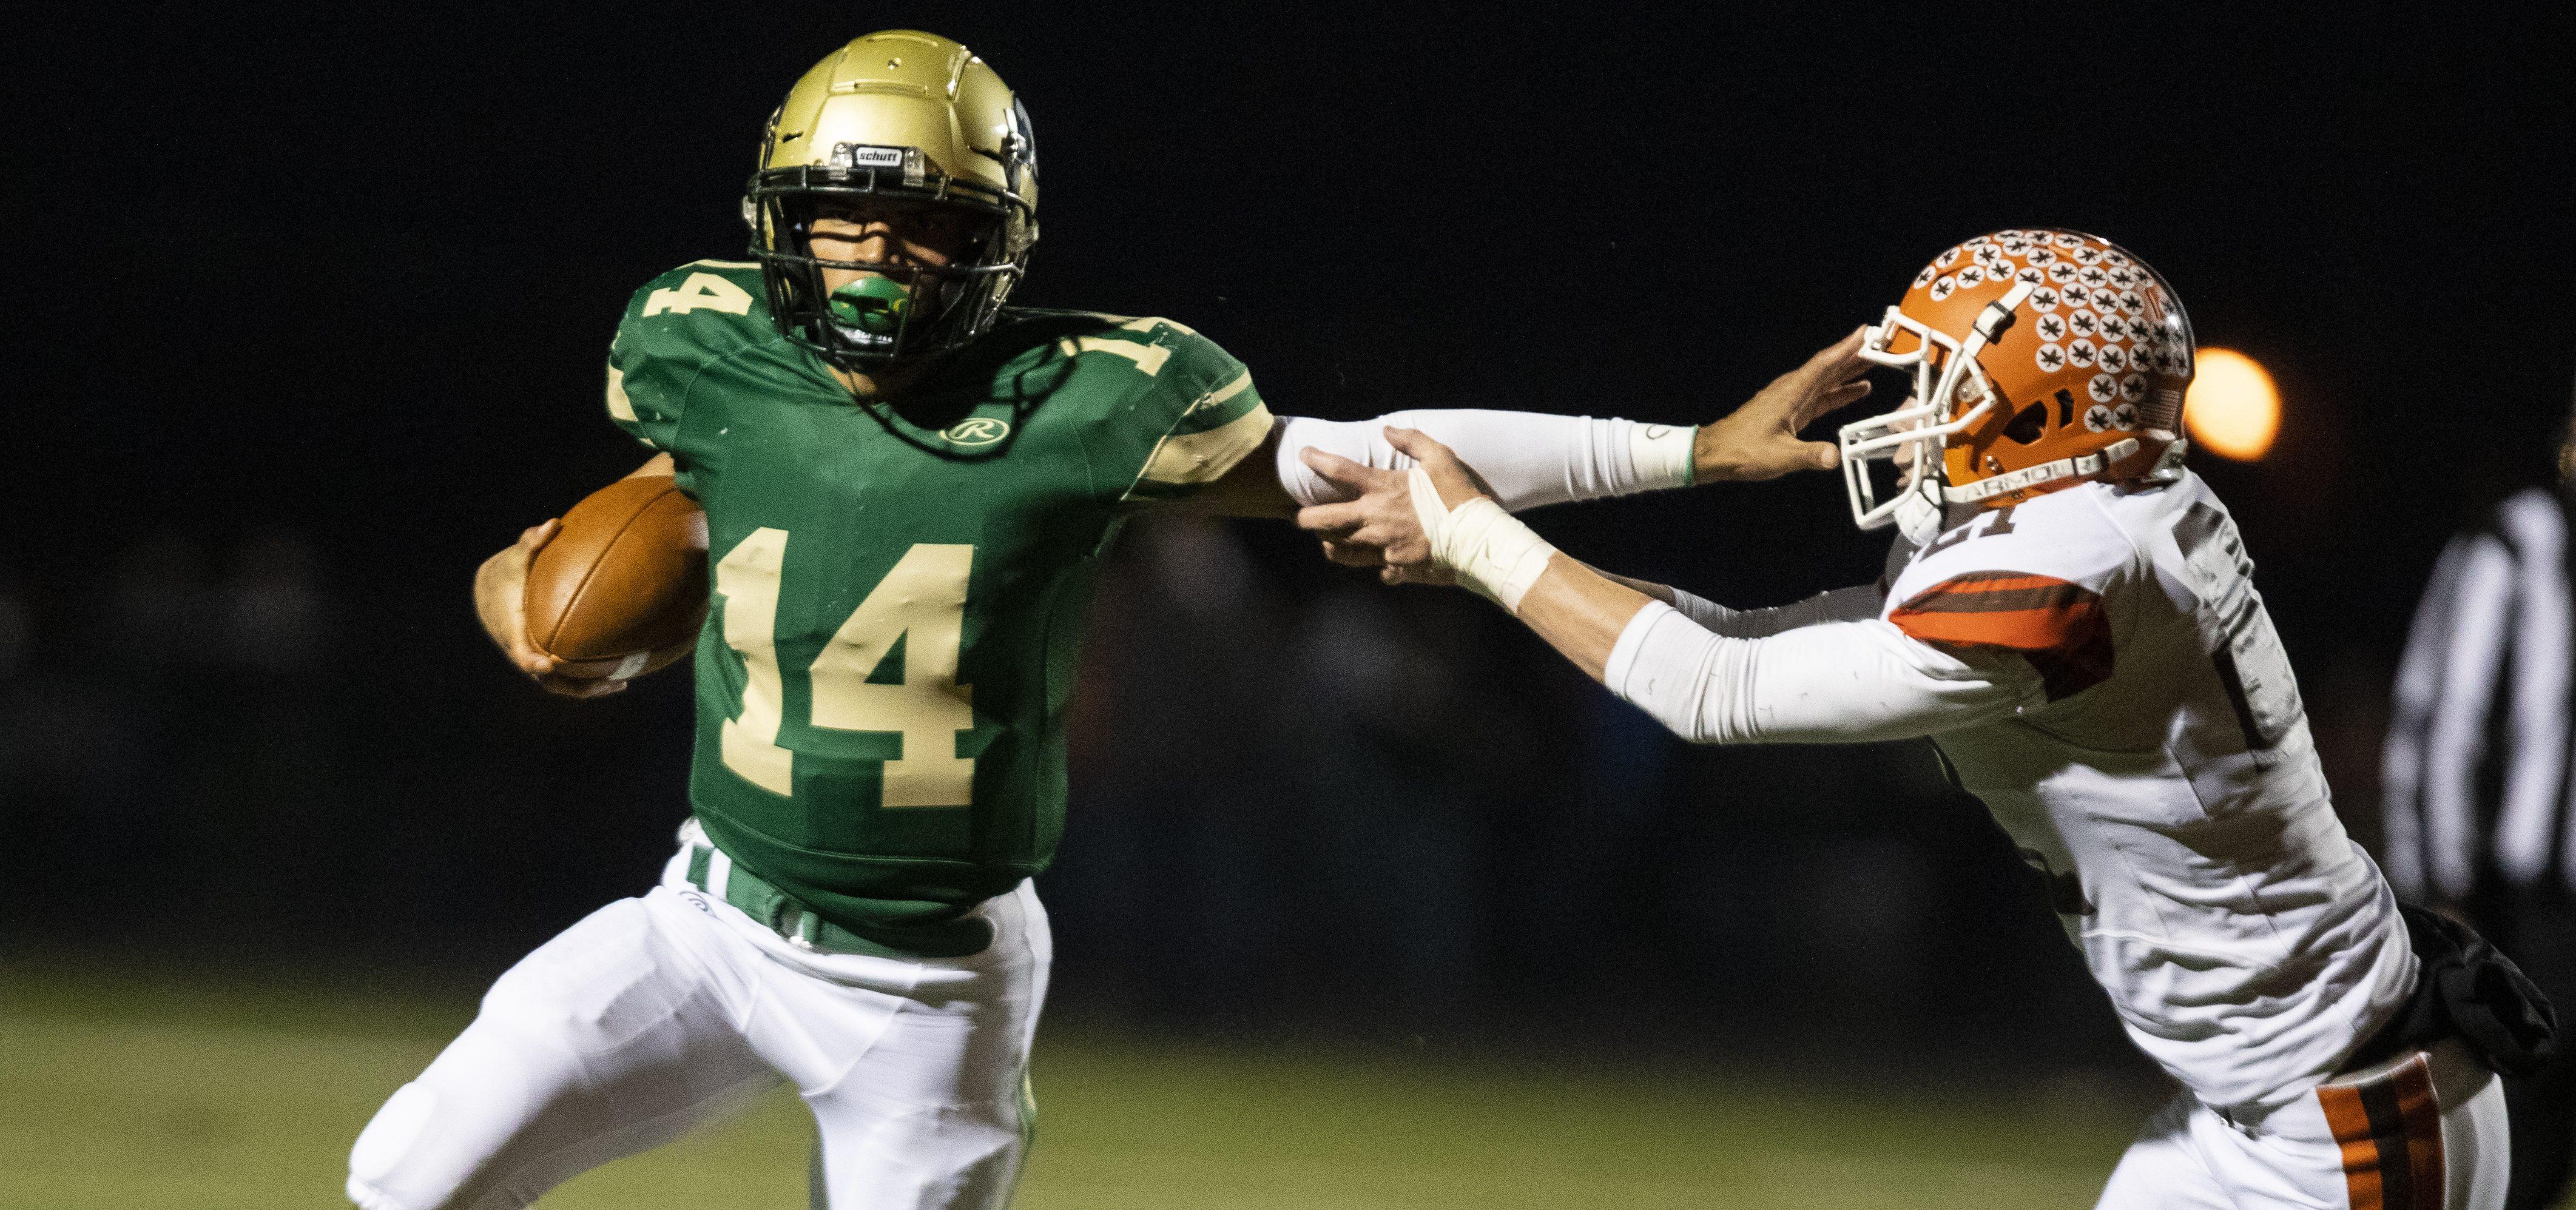 Athens quarterback Joey Moore stiff arms a Nelsonville-York players (Yukia/WOUB.